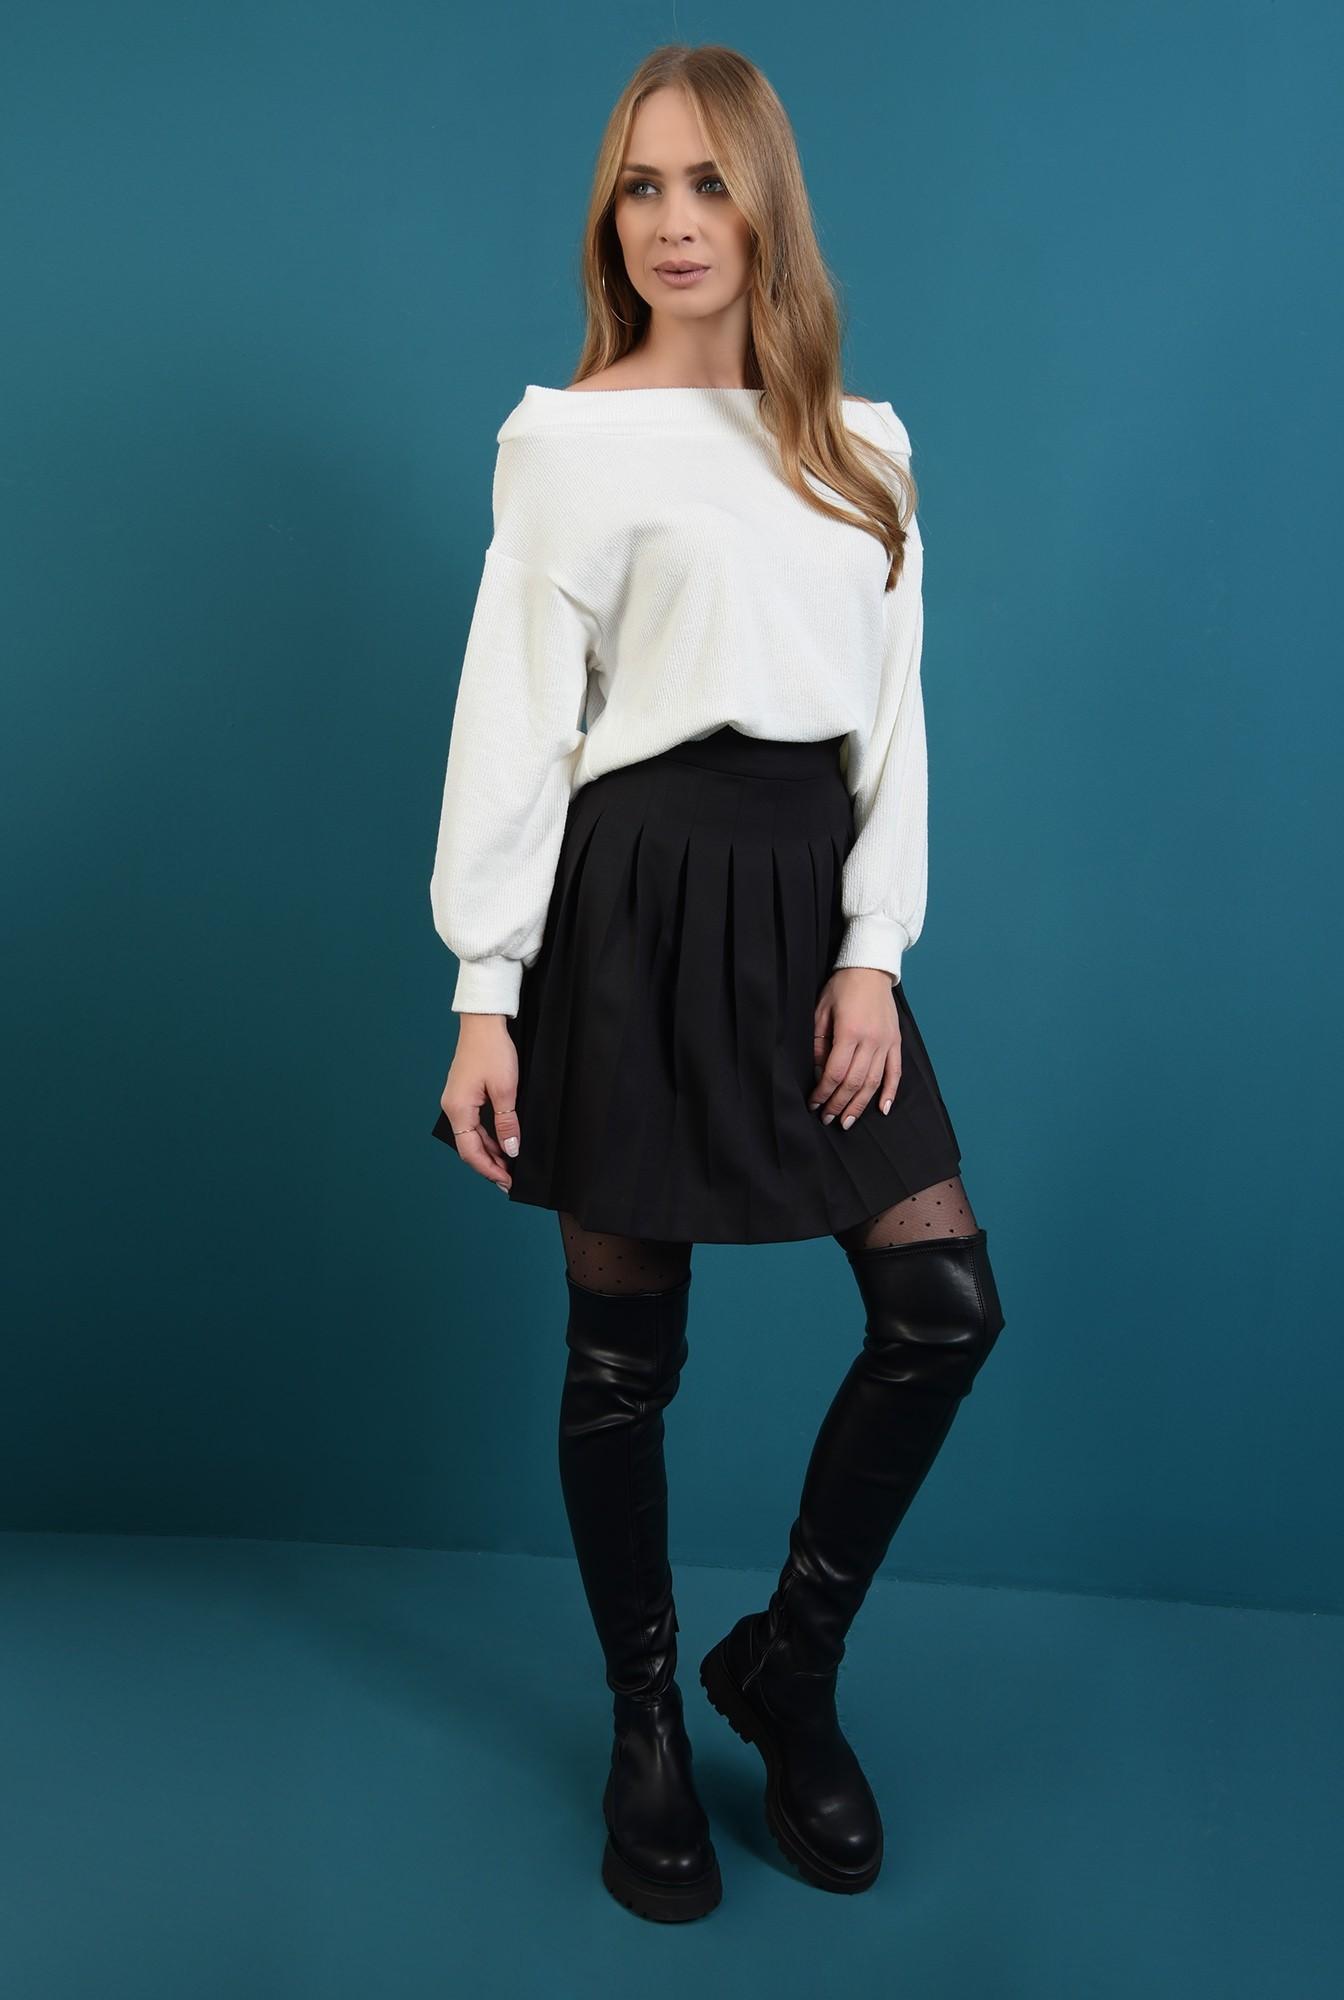 0 - pulover tricotat, alb, cu maneca bufanta